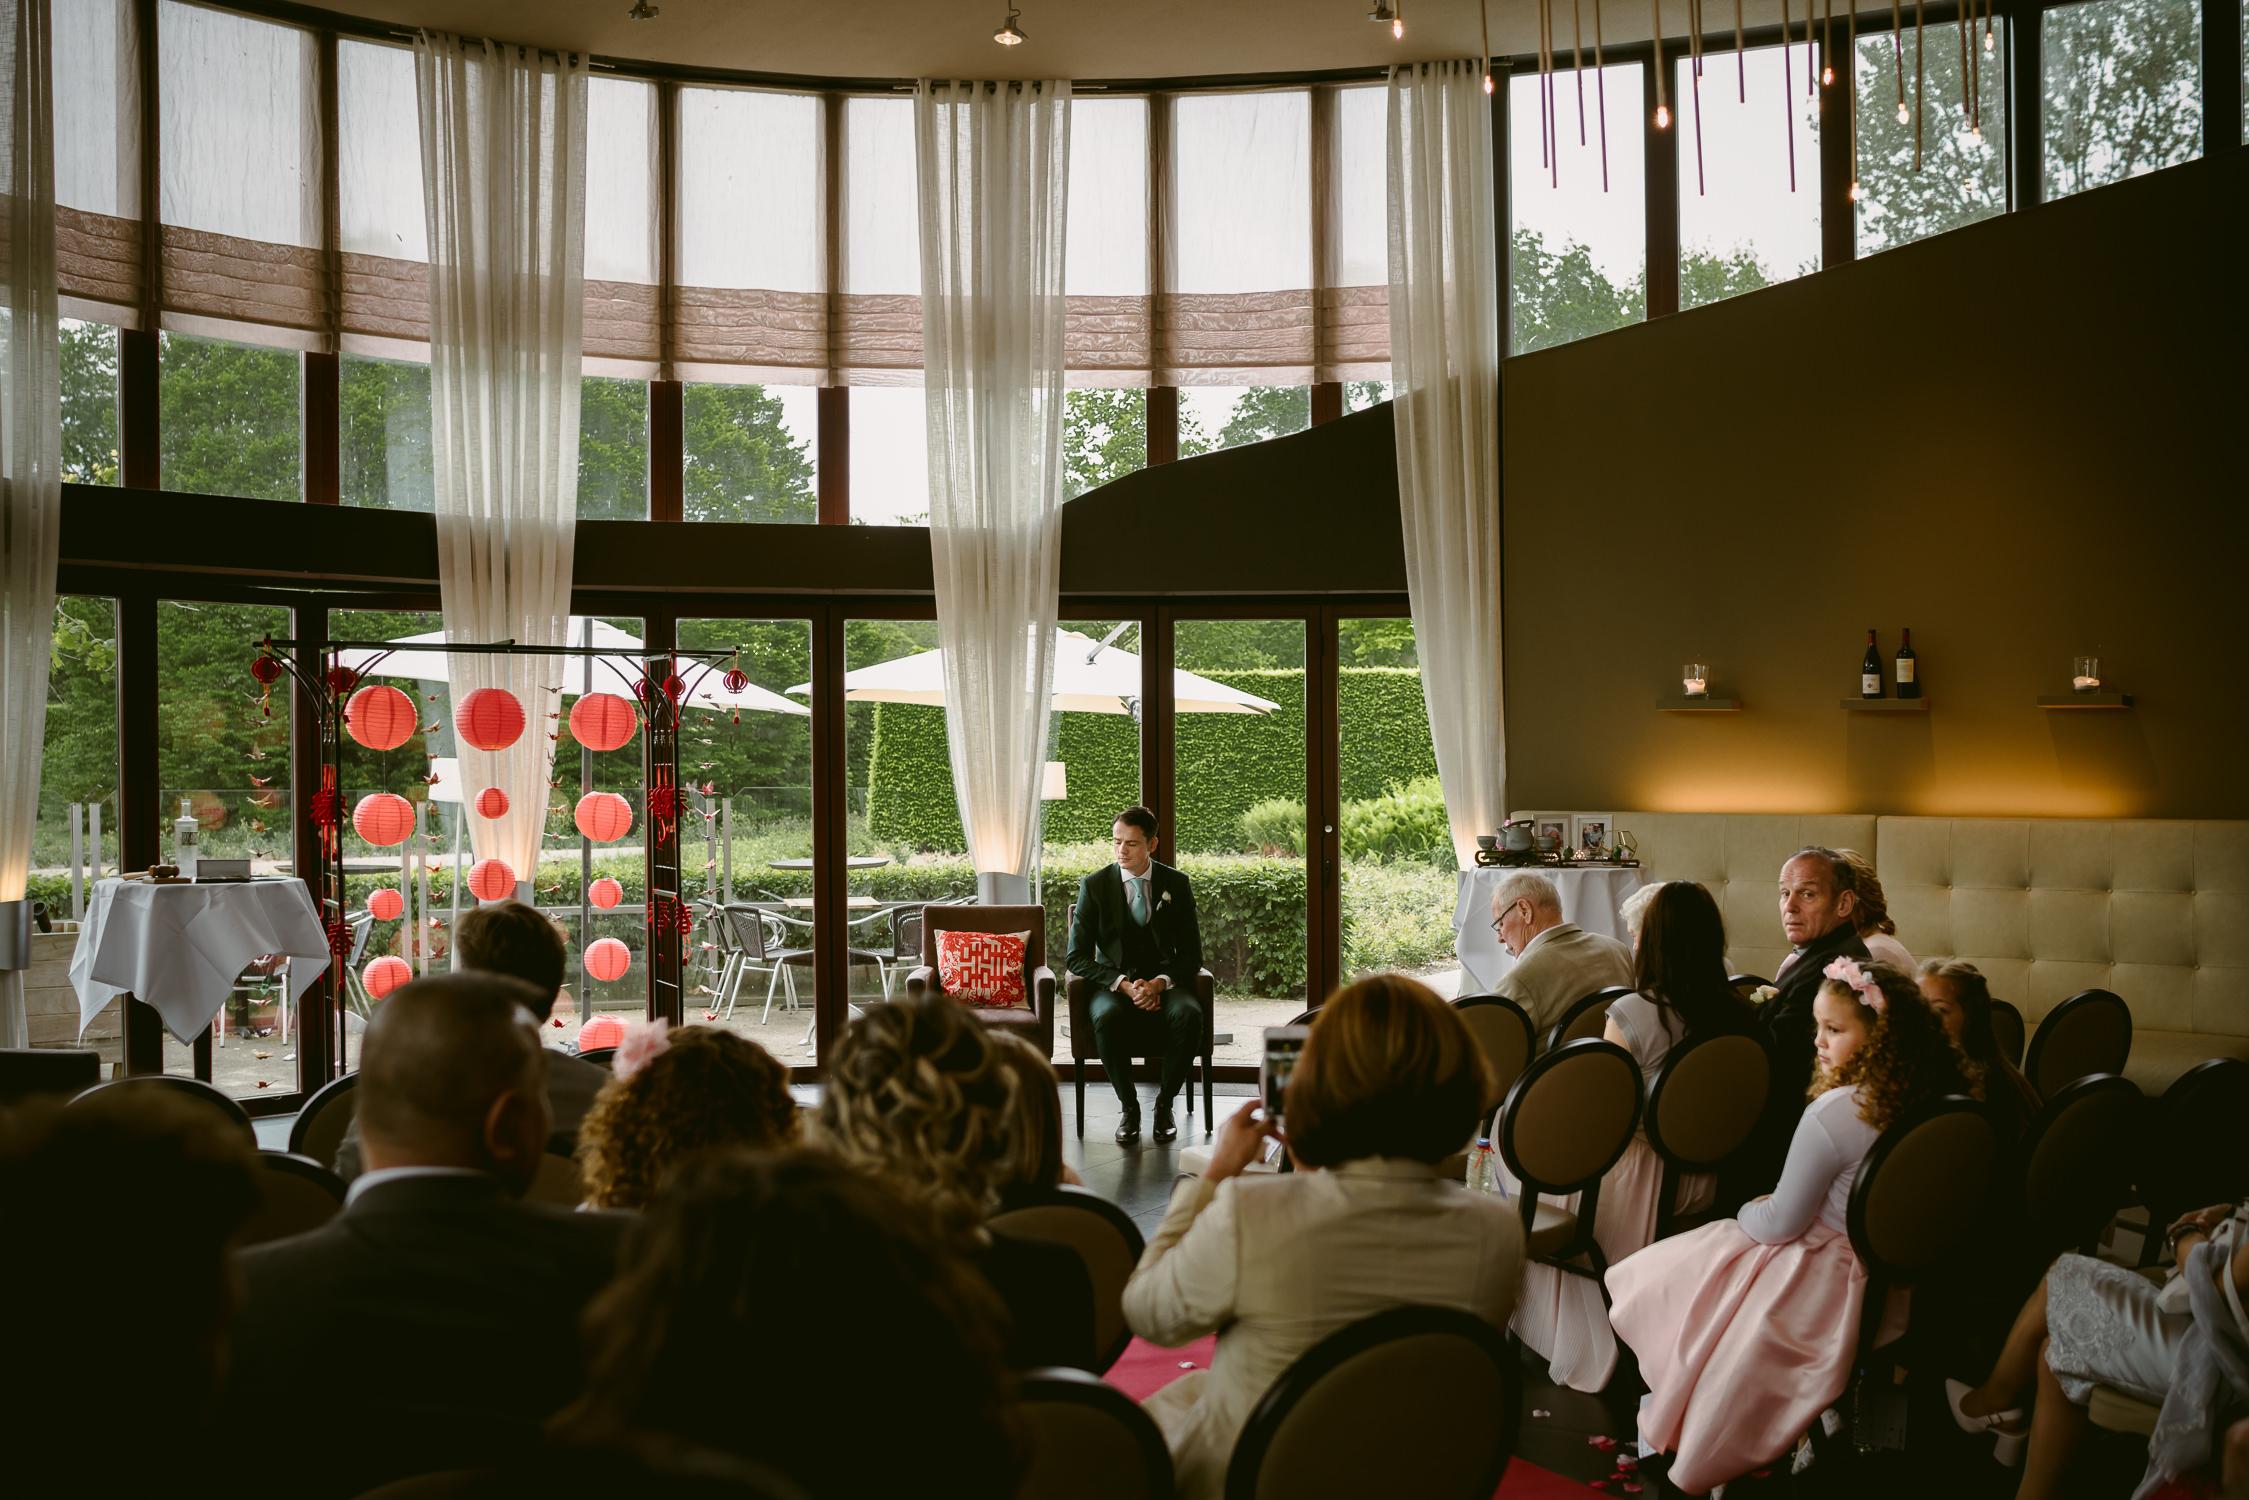 bruidsfotografie-amsterdam-utrecht-trouwfotograaf-mark-hadden-wedding-photography-Robin & Guus-161.jpg